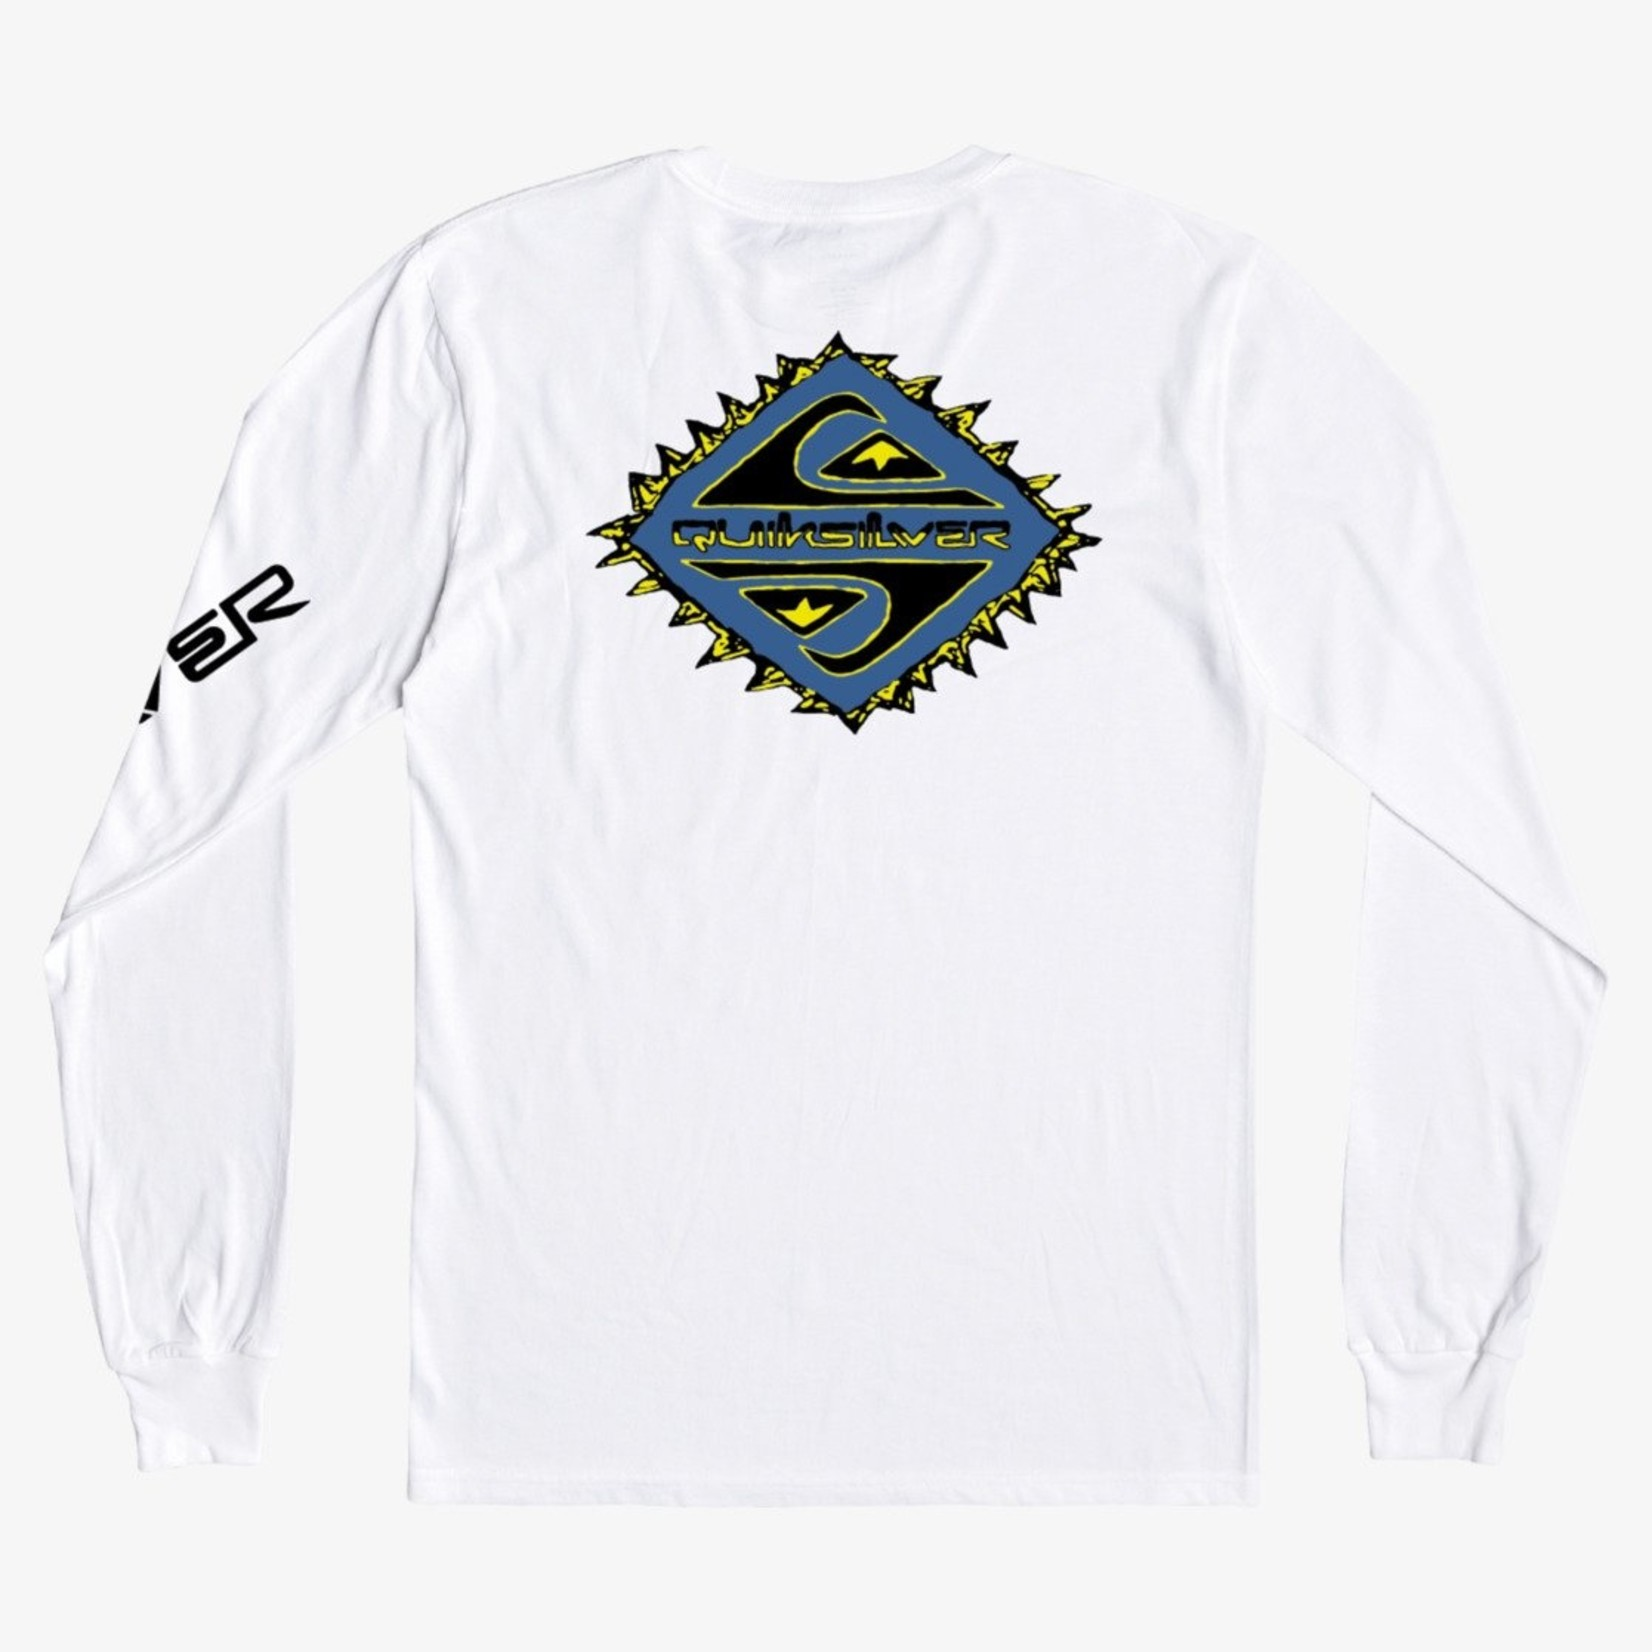 Quiksilver Quiksilver Return To The Moon LS T-Shirt